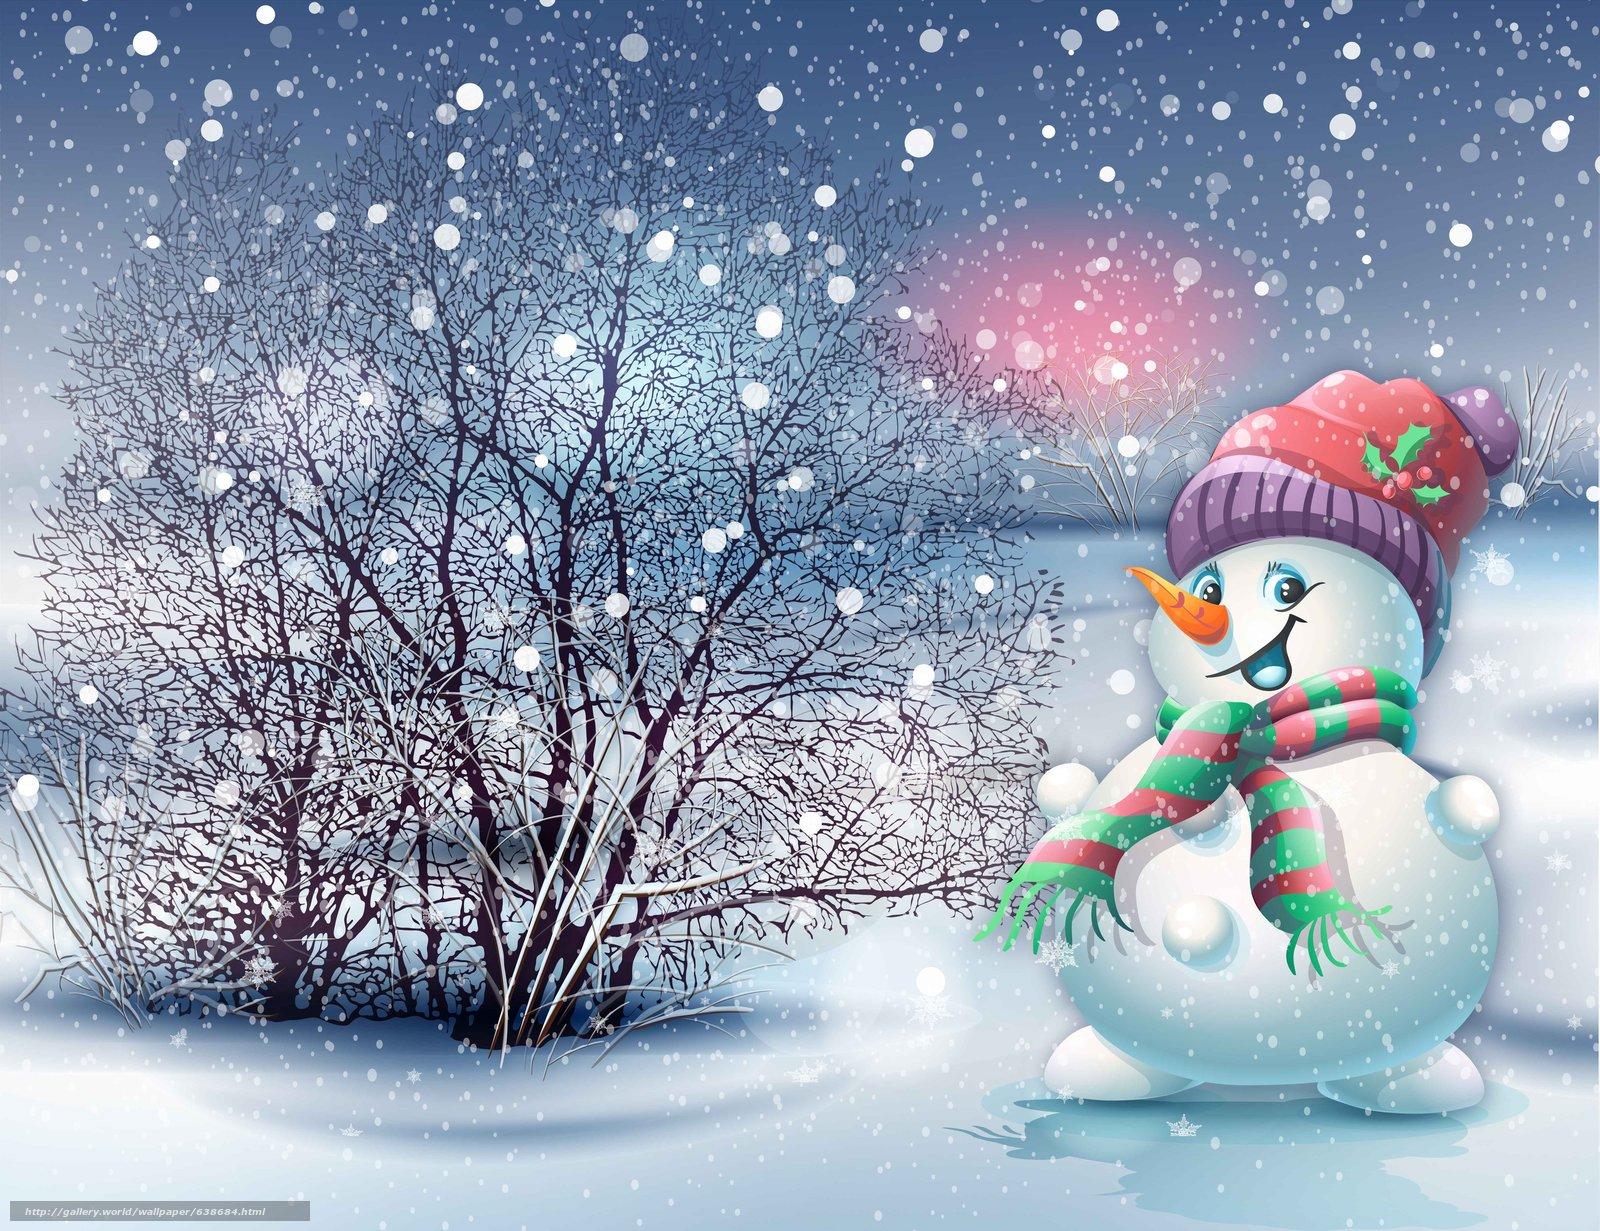 Download wallpaper snowman christmas wallpaper snow free for Natale immagini per desktop